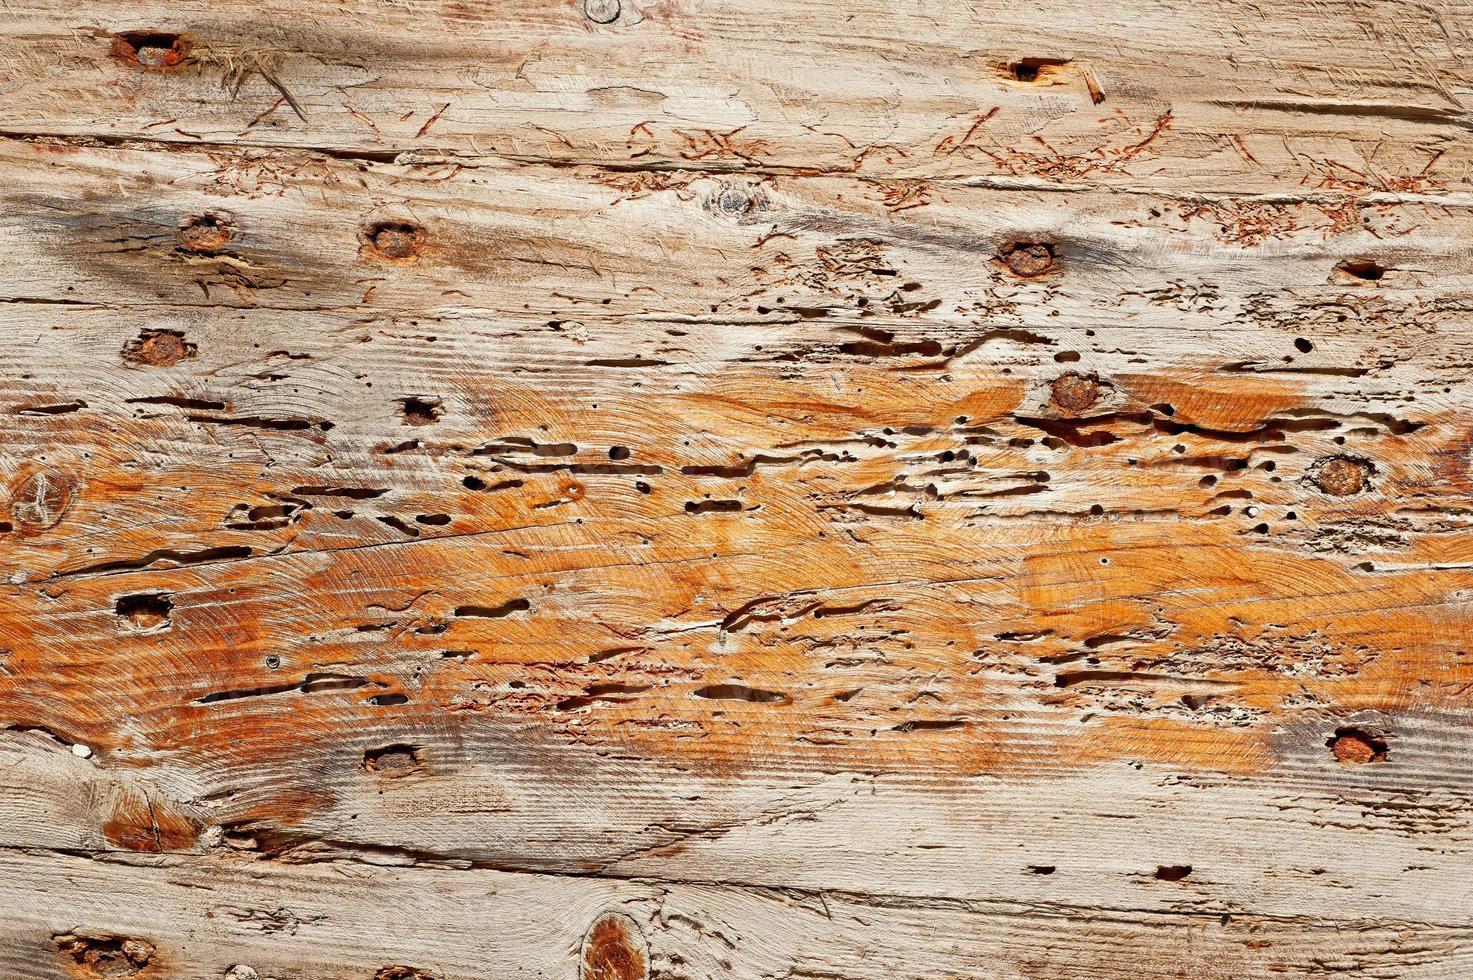 anobium thomsoni schade op hout foto